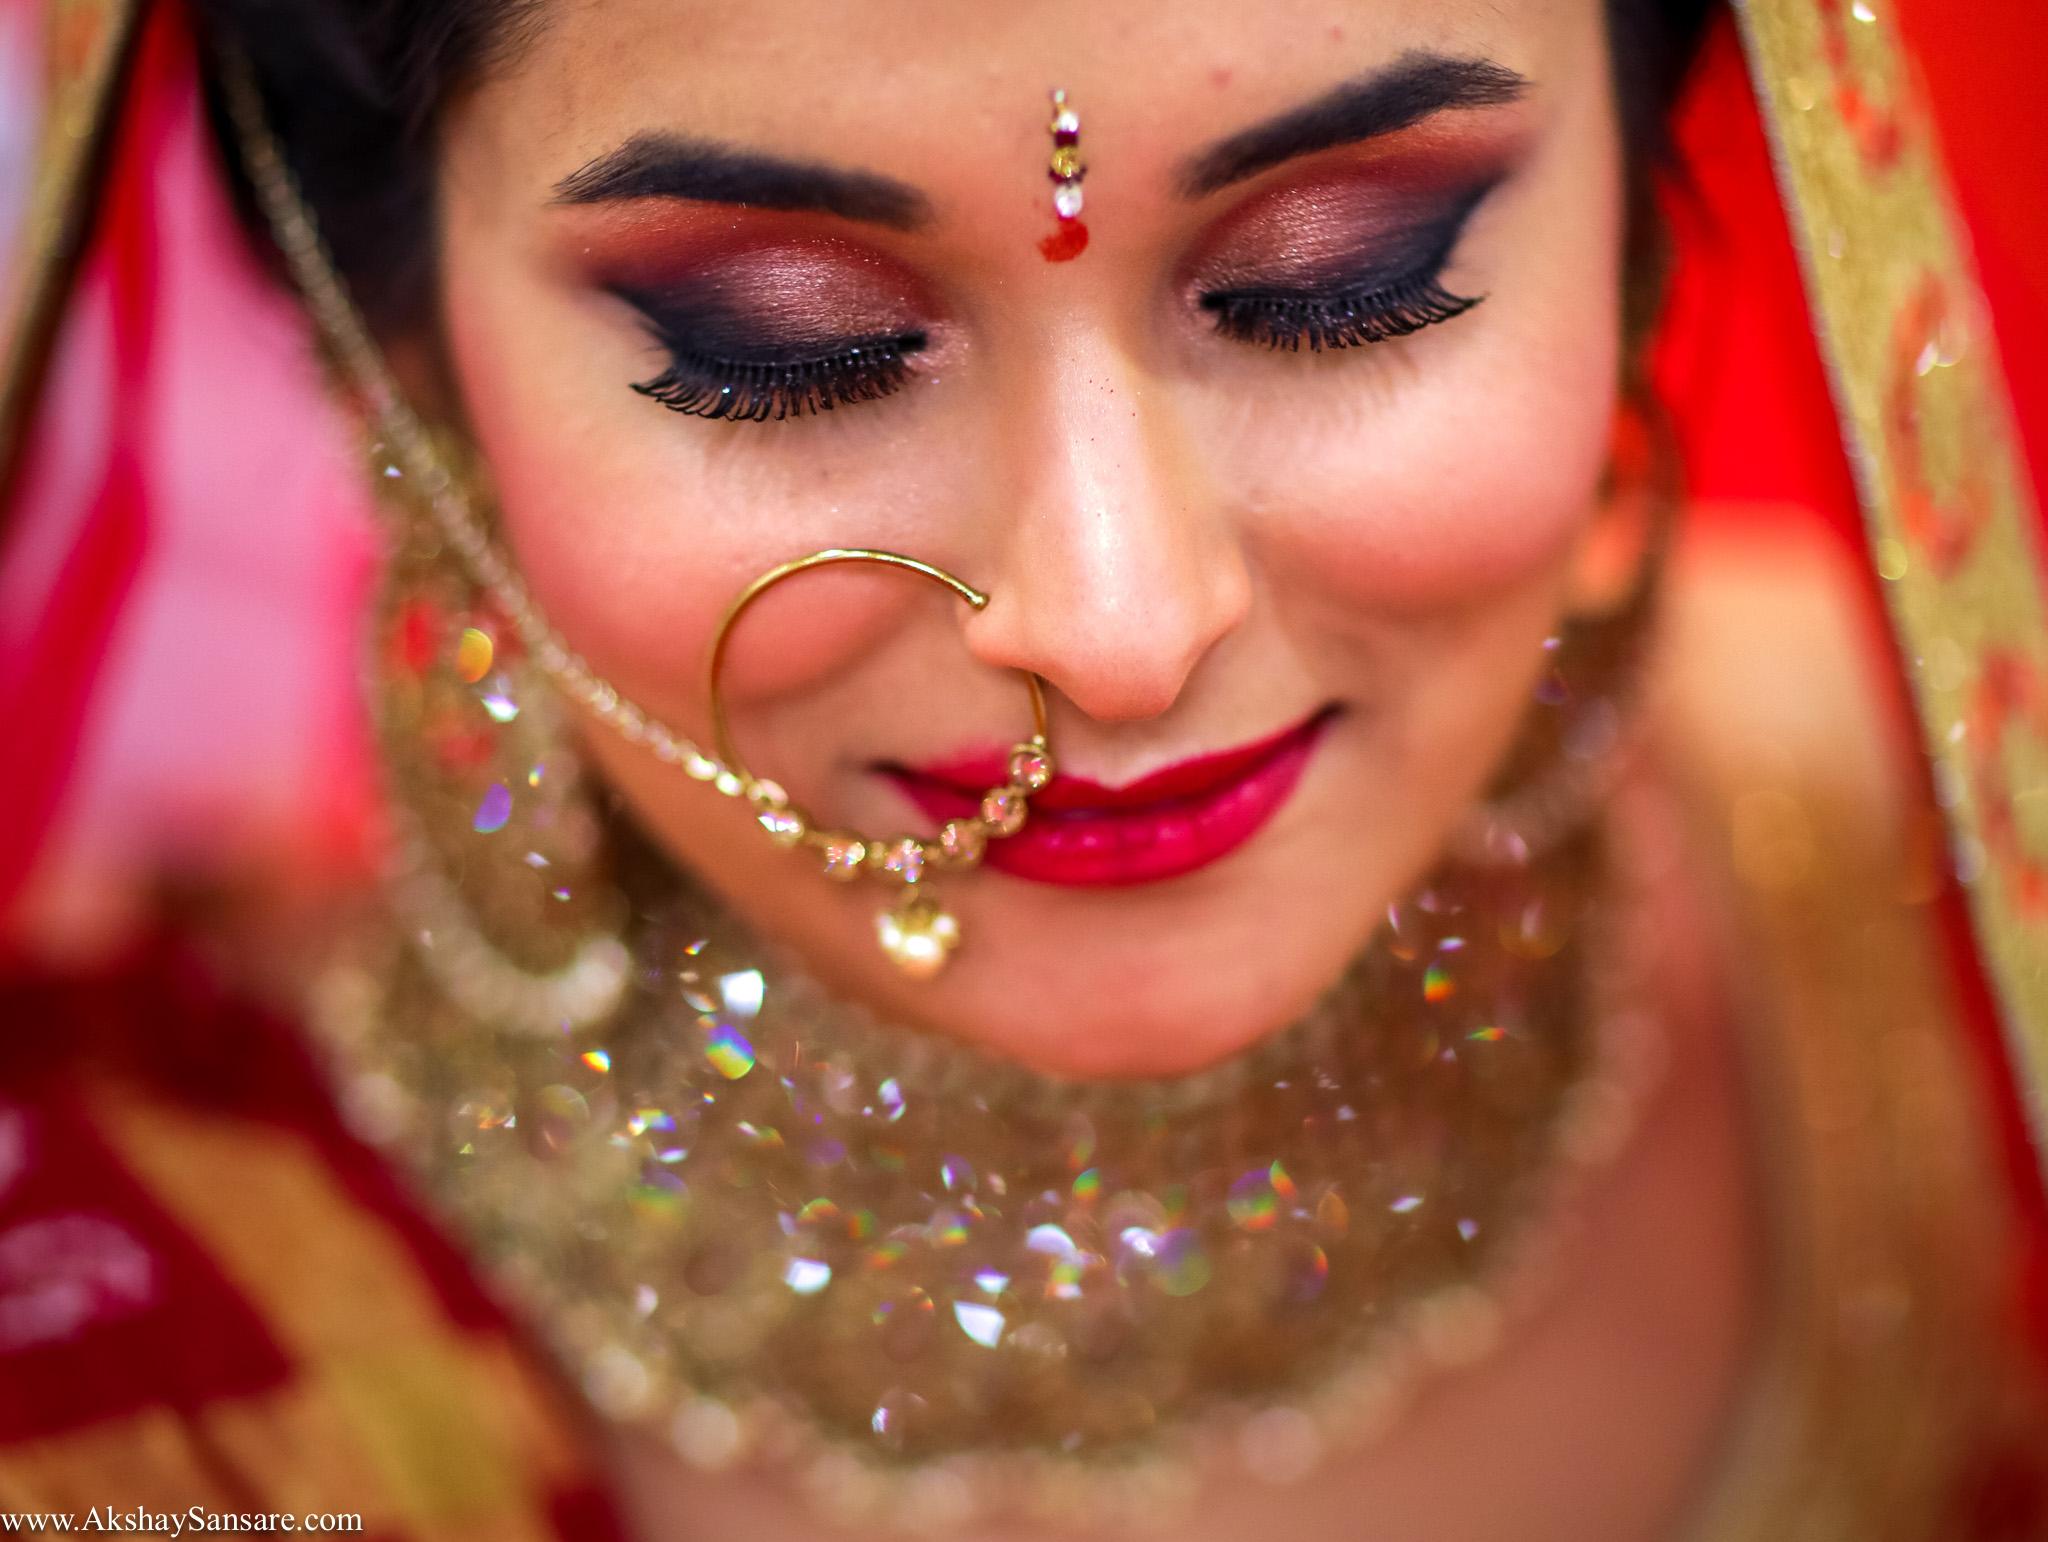 Akshay Sansare Photography Kunal x Shrutika best candid photographers in mumbai(36).jpg